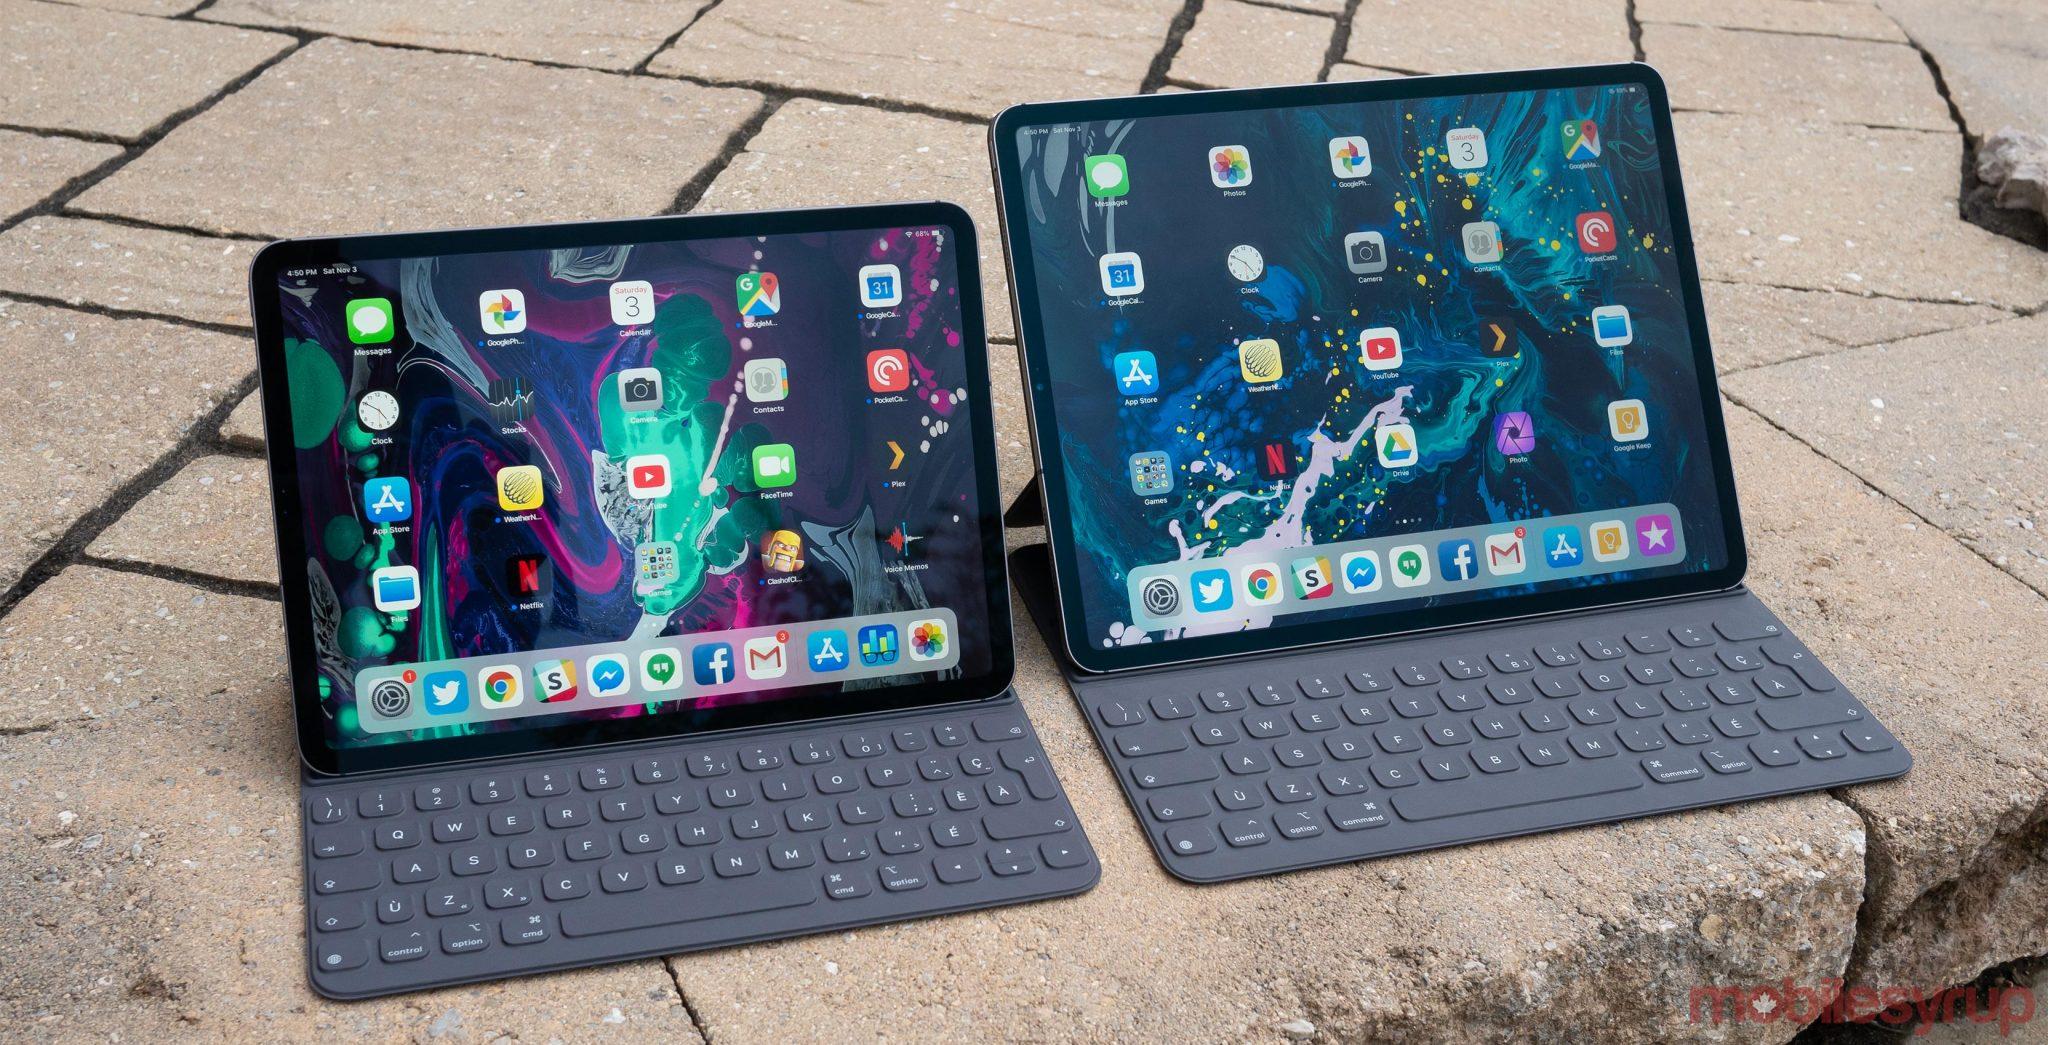 Điểm số iPad Pro 2018 phá vỡ kỷ lục ANTUTU Benchmark ...